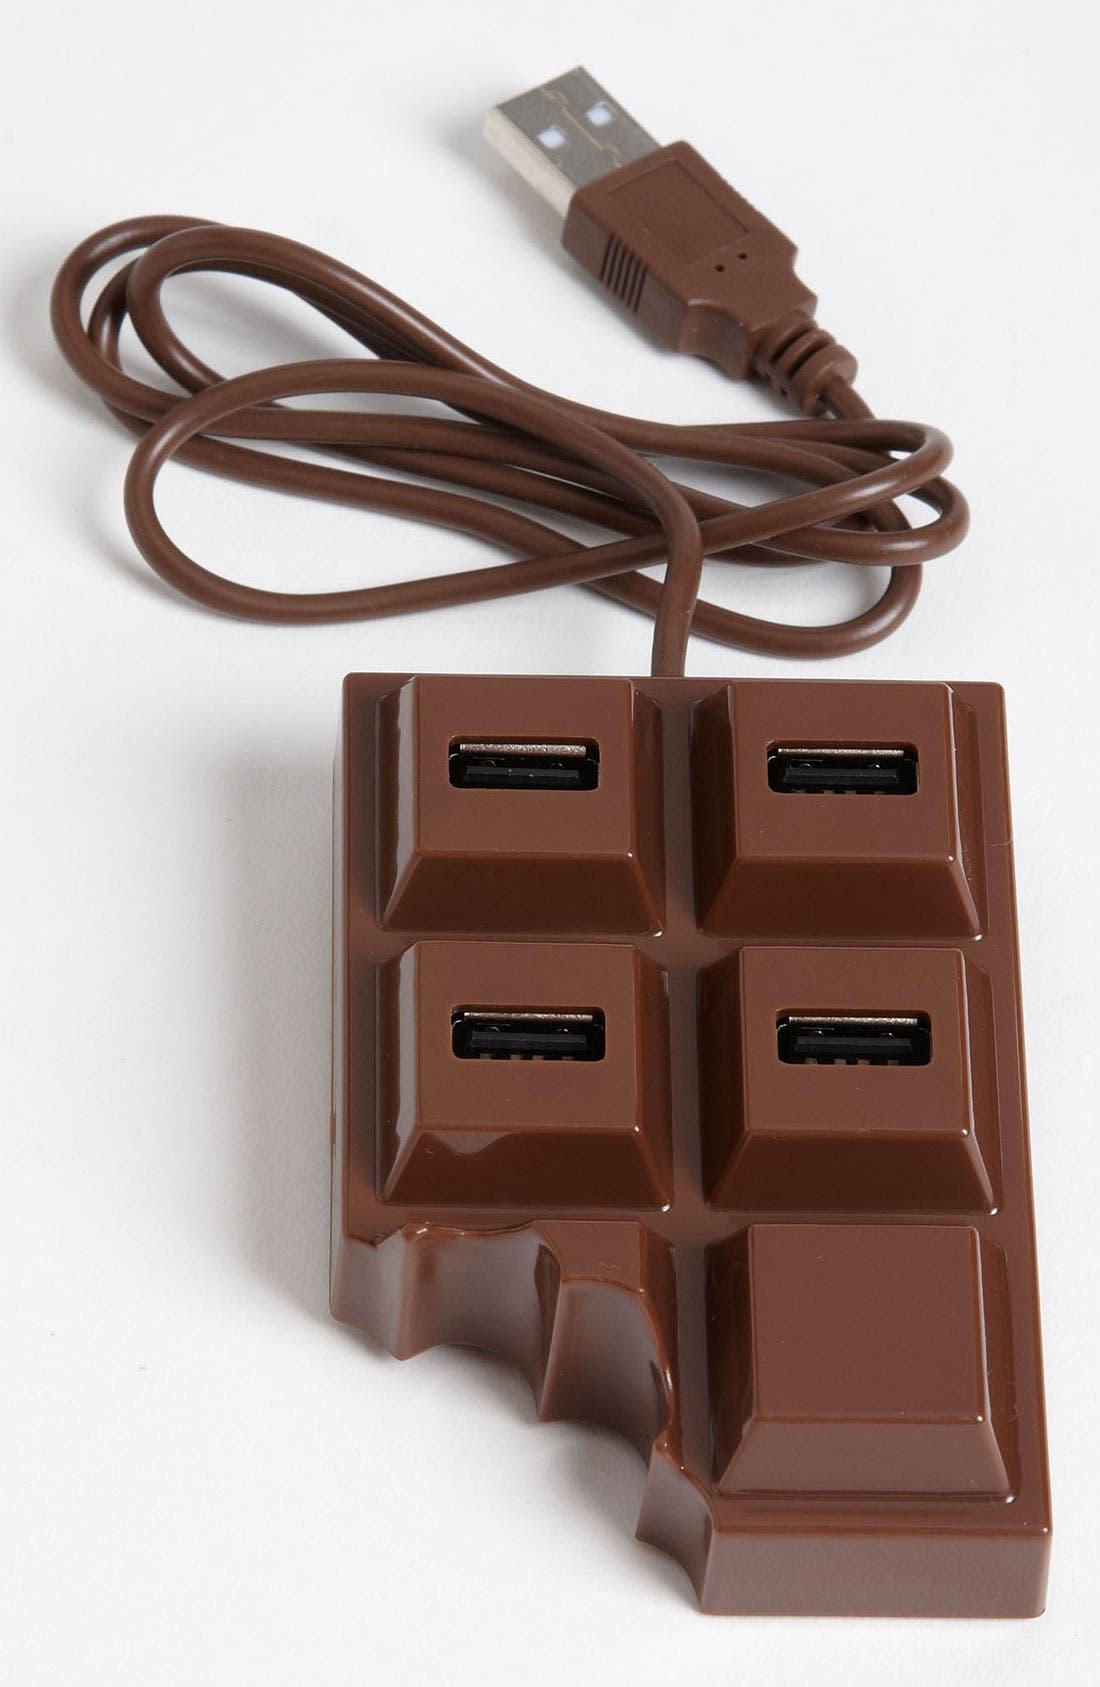 Alternate Image 1 Selected - Kikkerland Design 'Chocolate' USB Hub